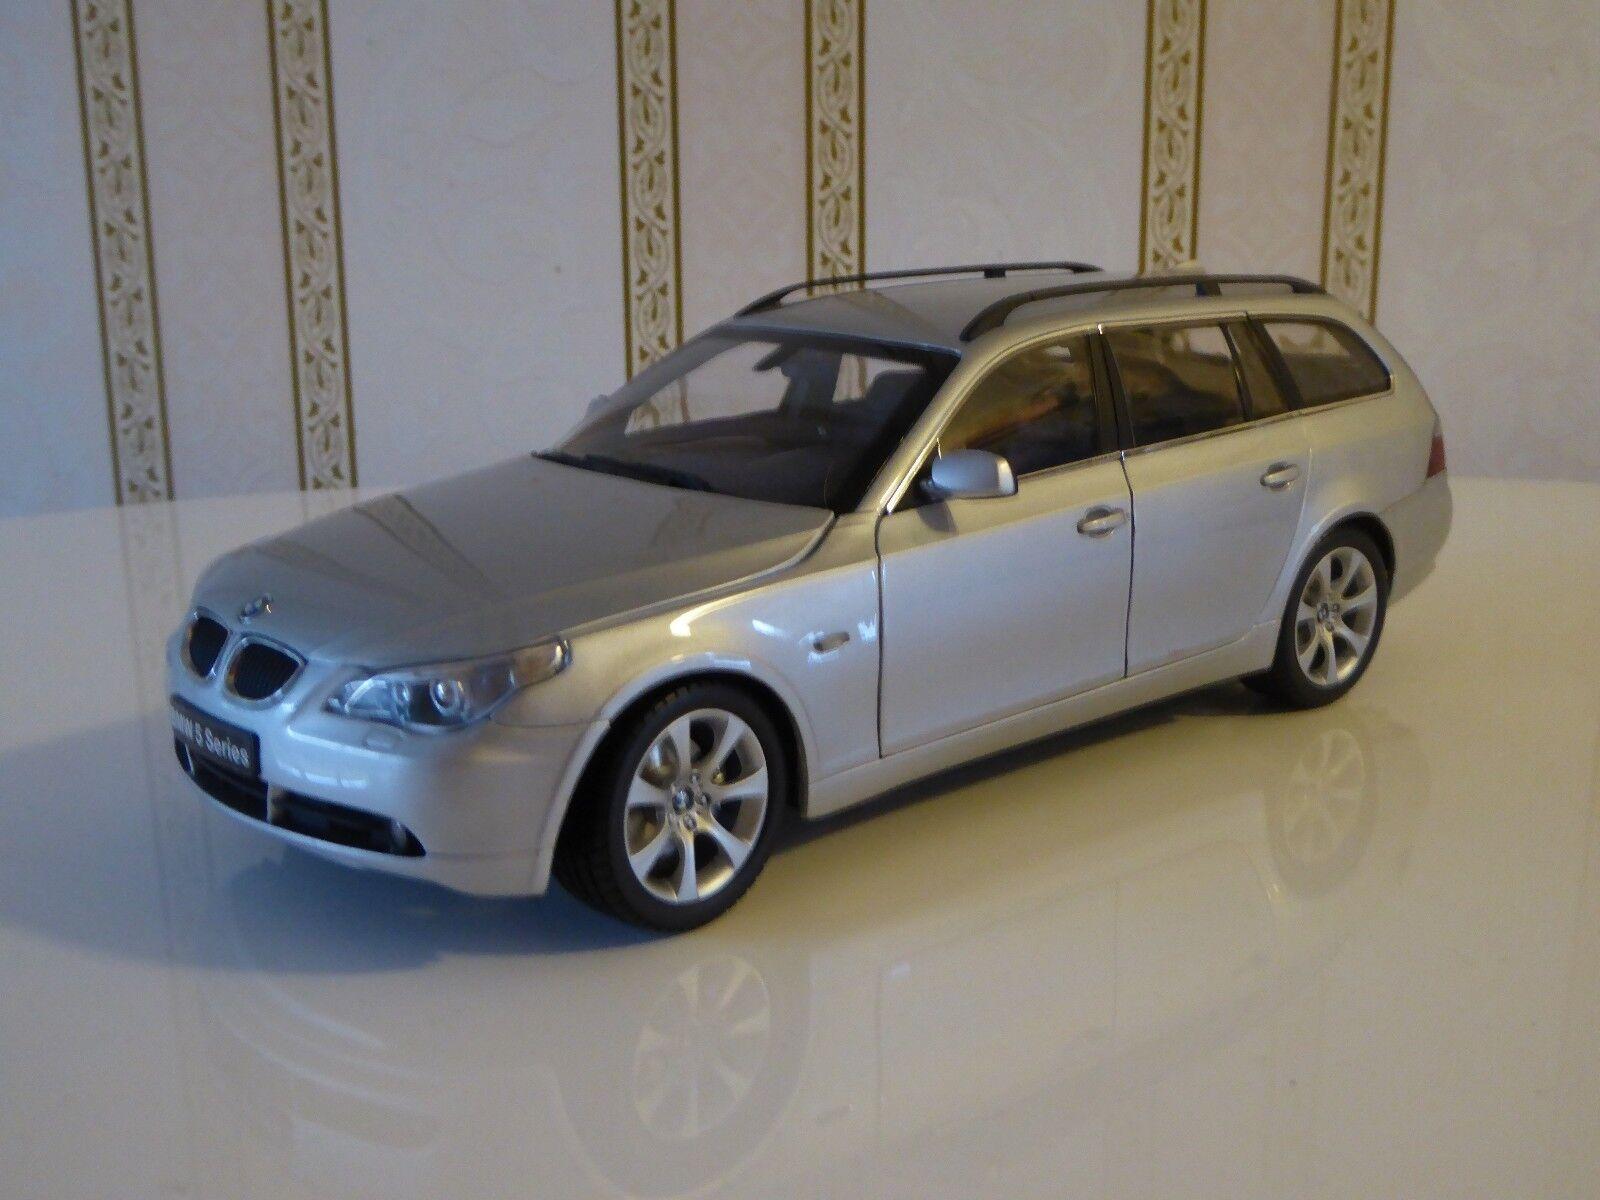 KYOSHO 1 18 BMW 545i Touring série 5 Argent No.08592S - superbe modèle